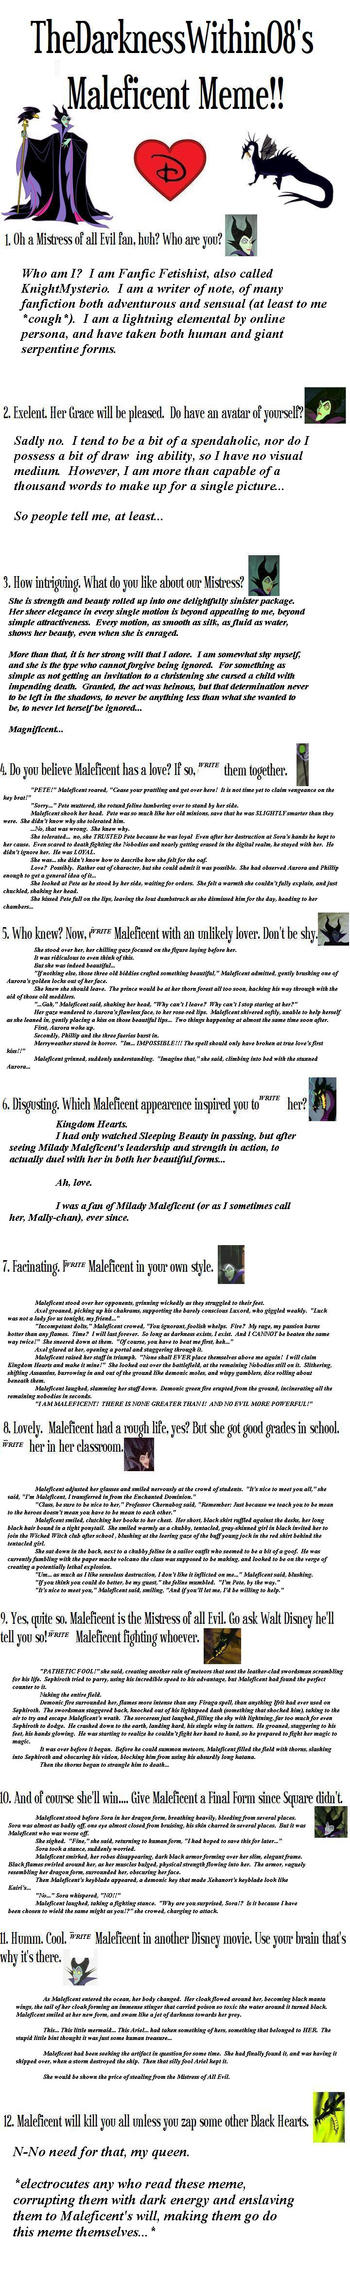 Maleficent Meme by FanficFetishist